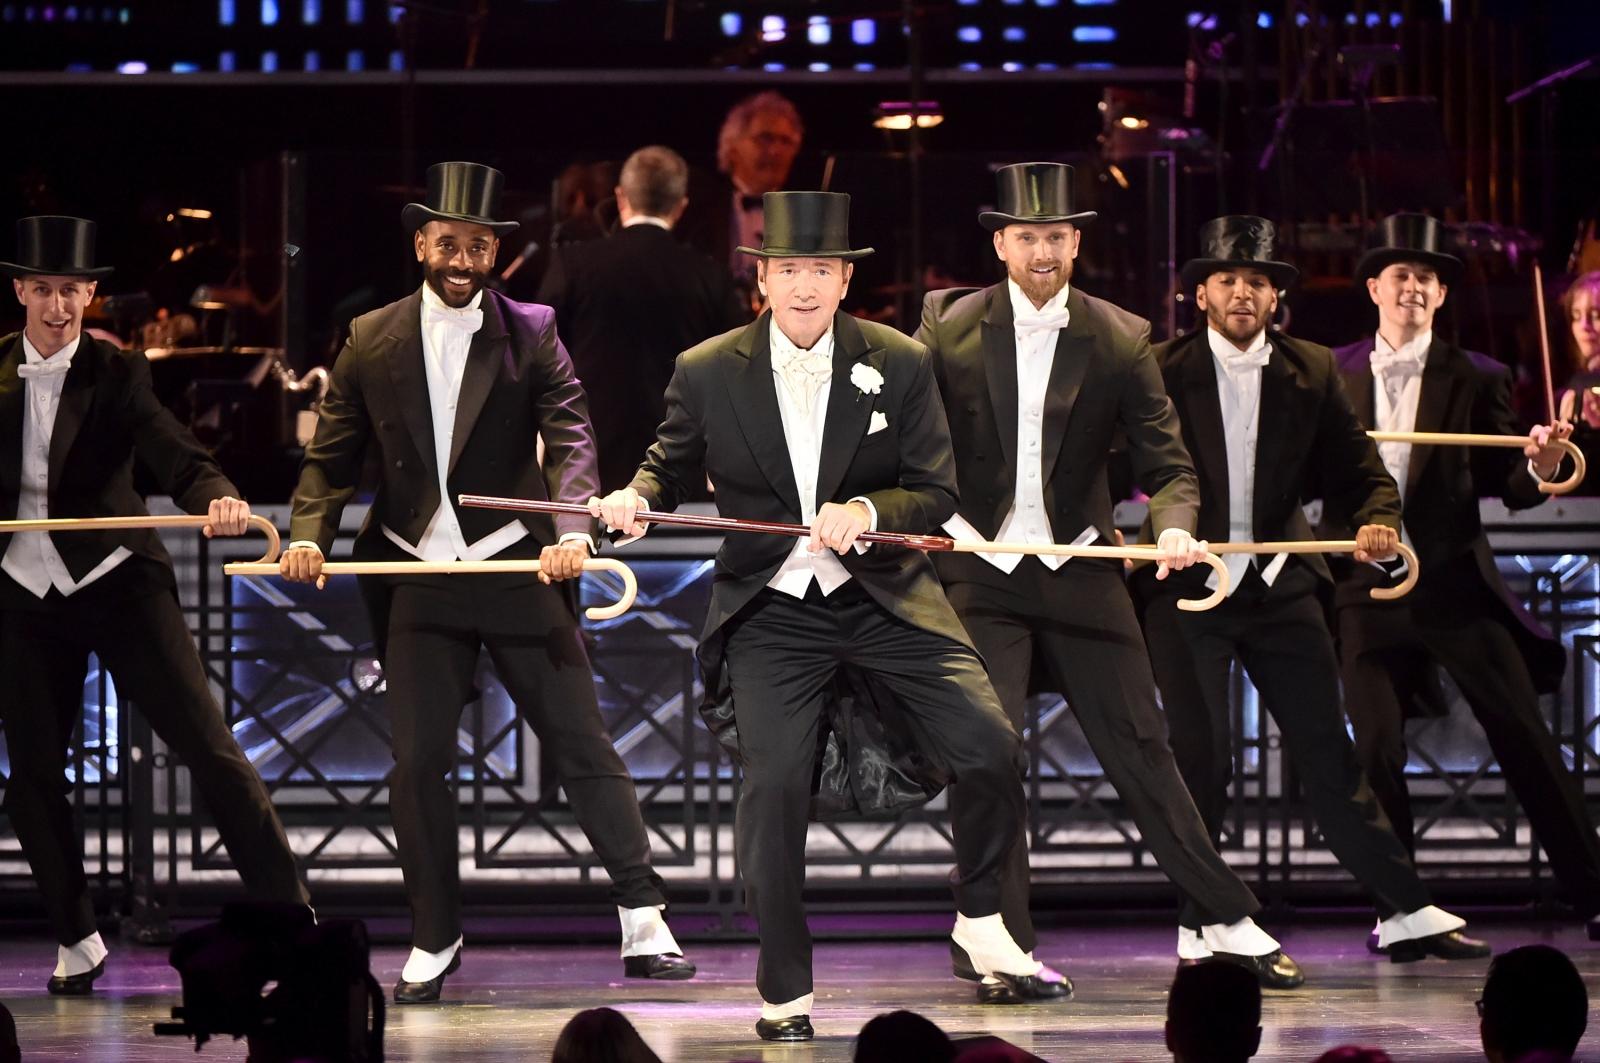 Tony Awards 2017 Best Musical Nominees  PEOPLEcom